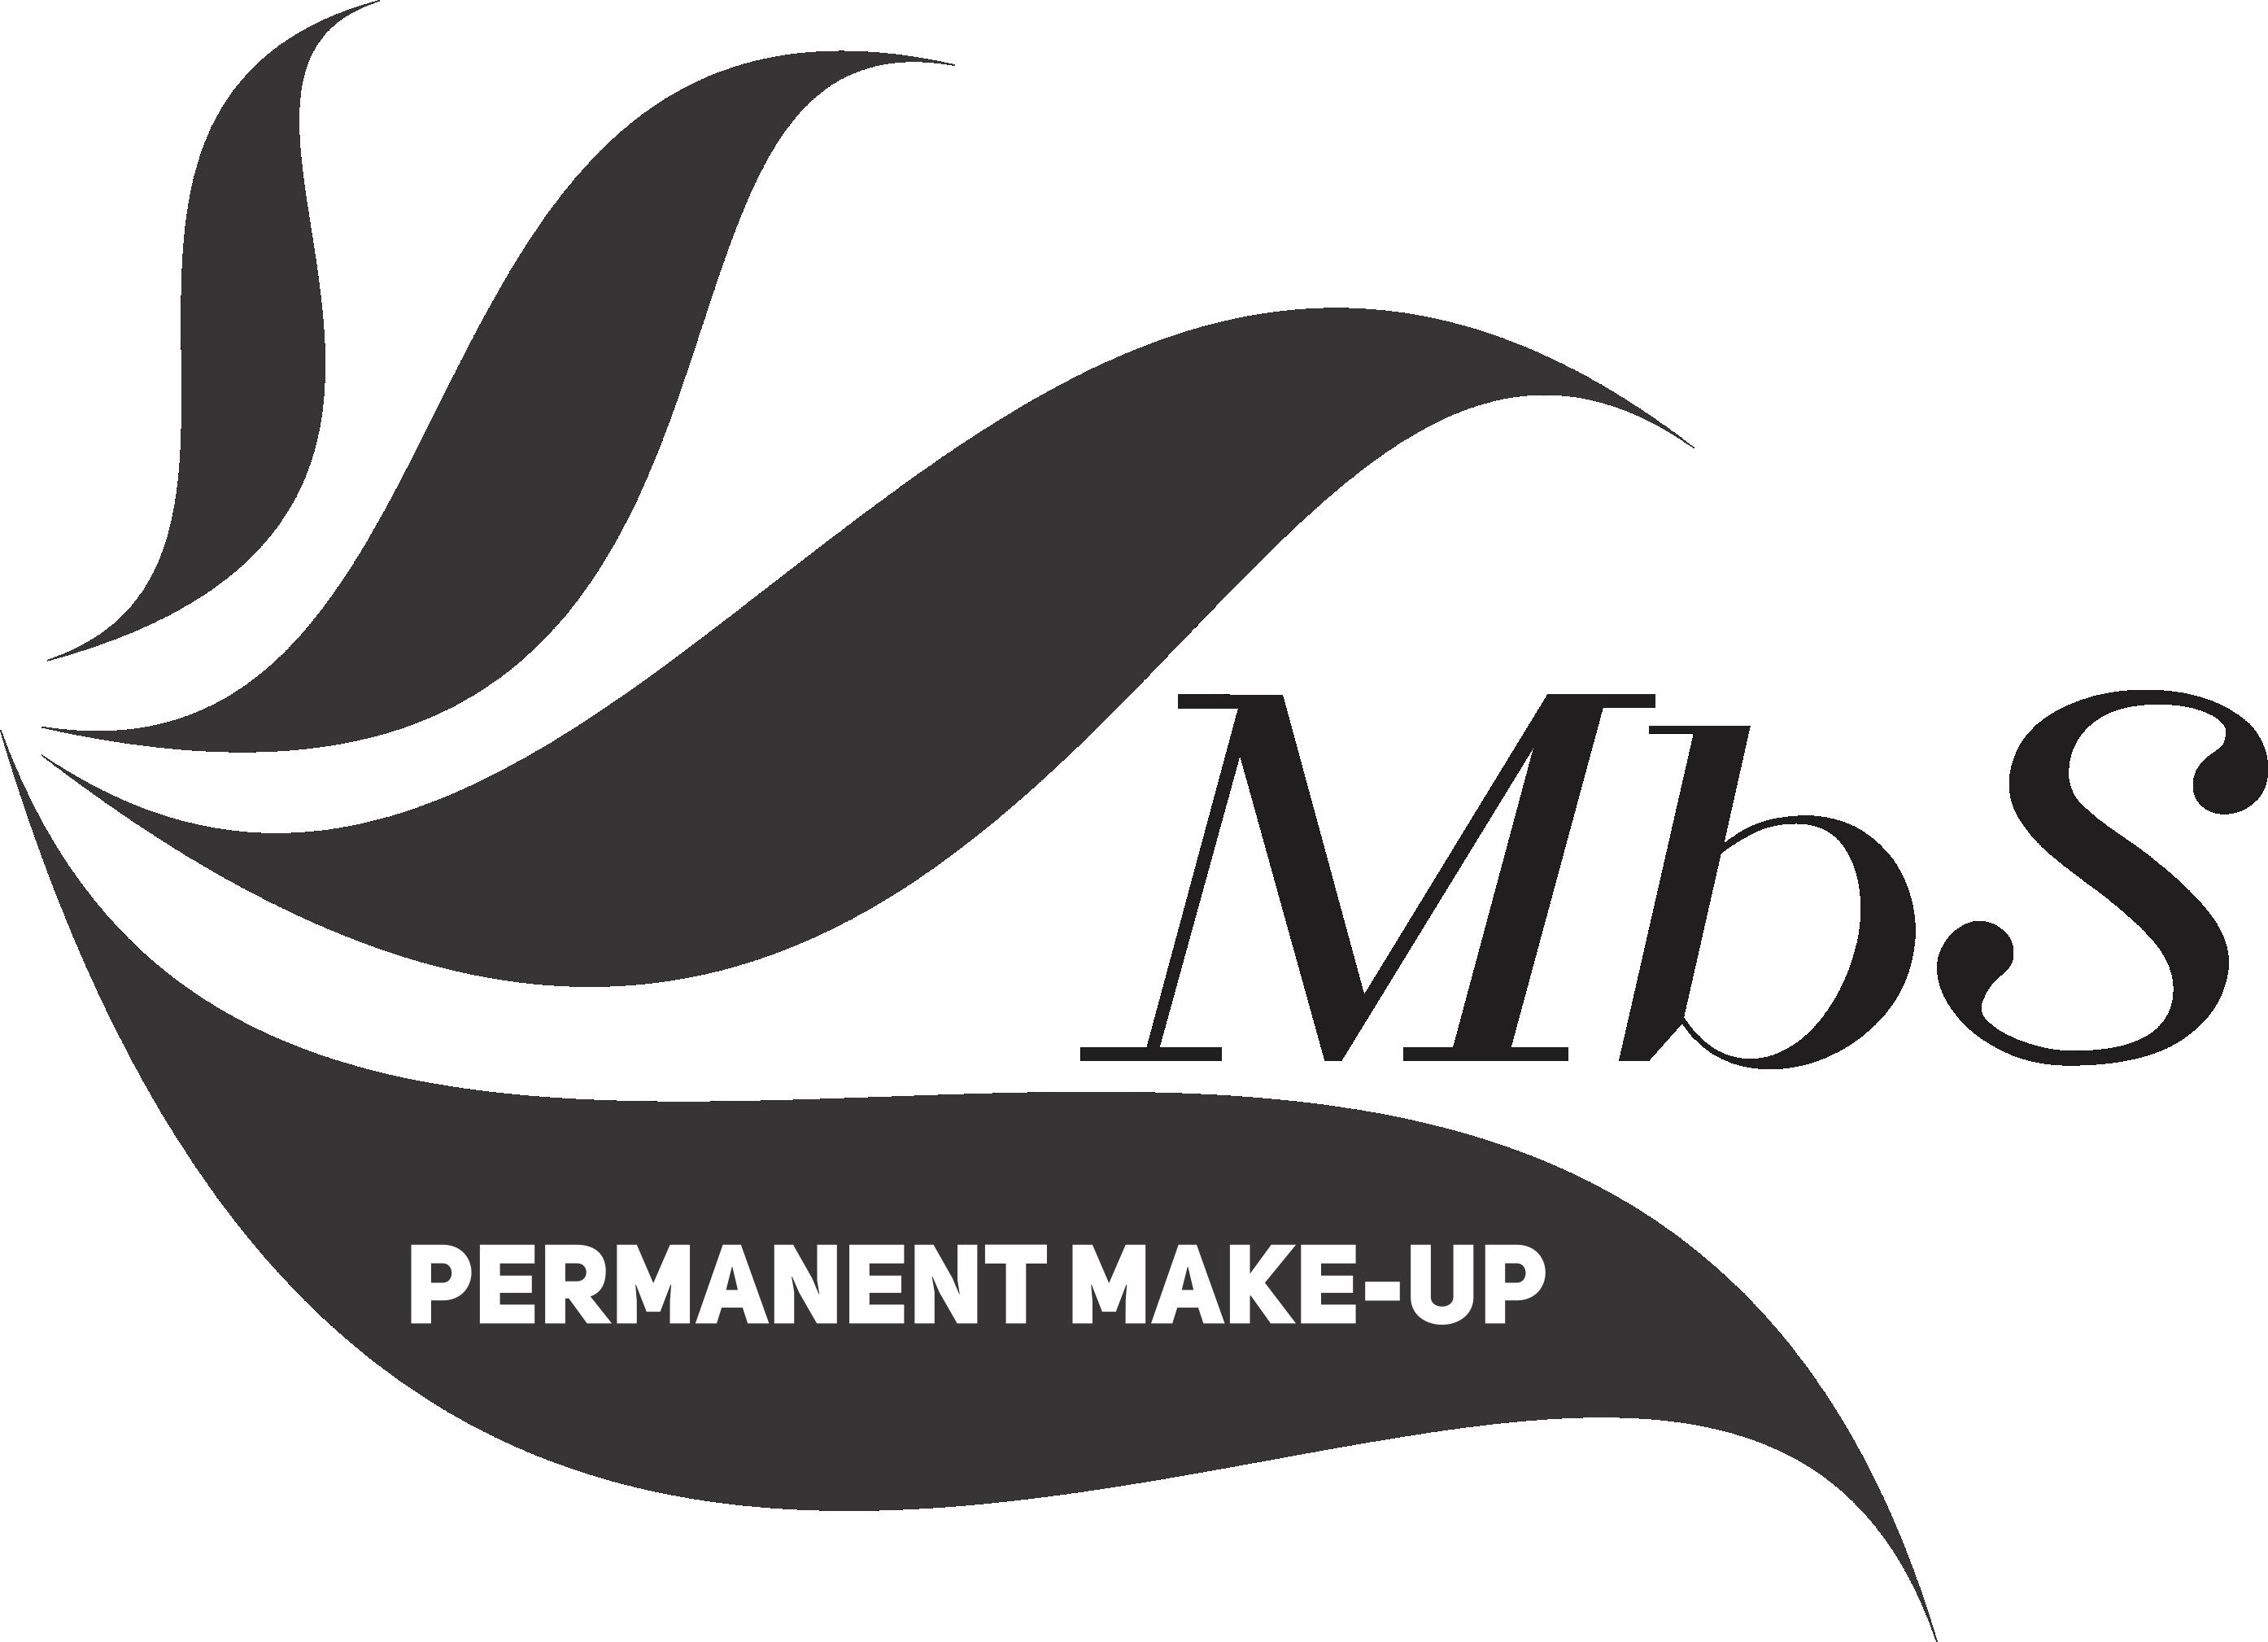 MbS permanent makeup